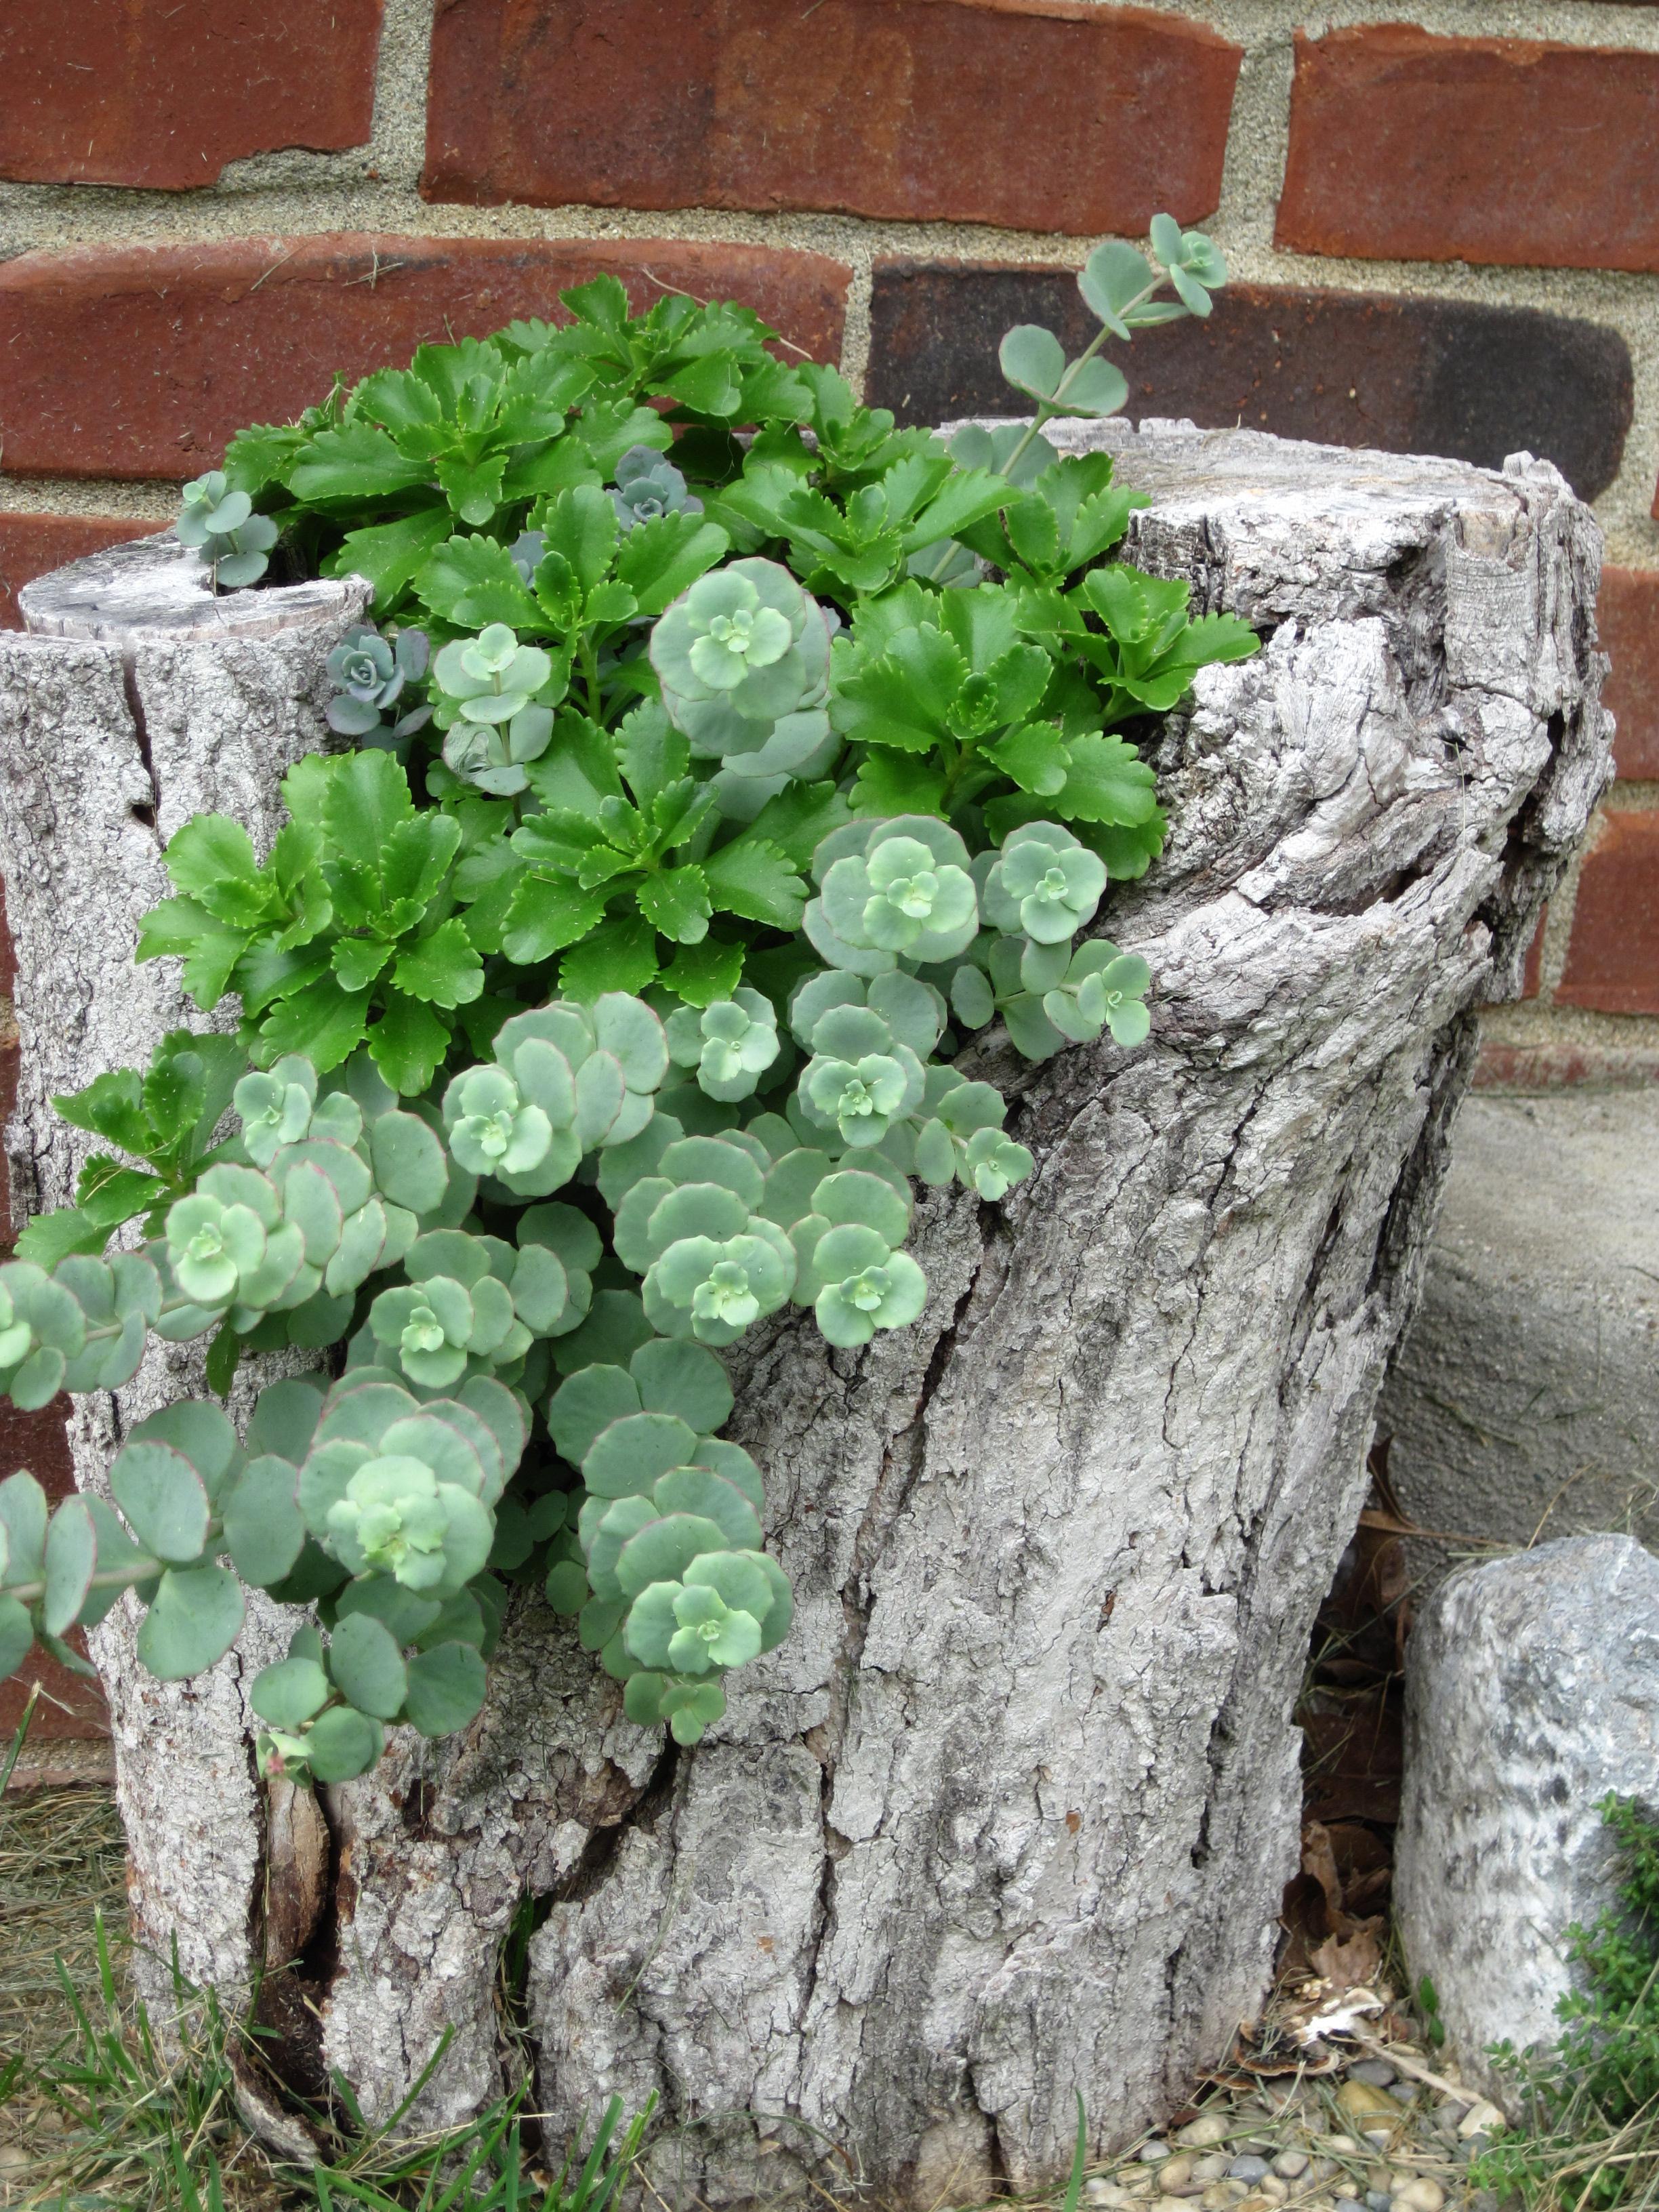 planta dentro de un trozo de tronco